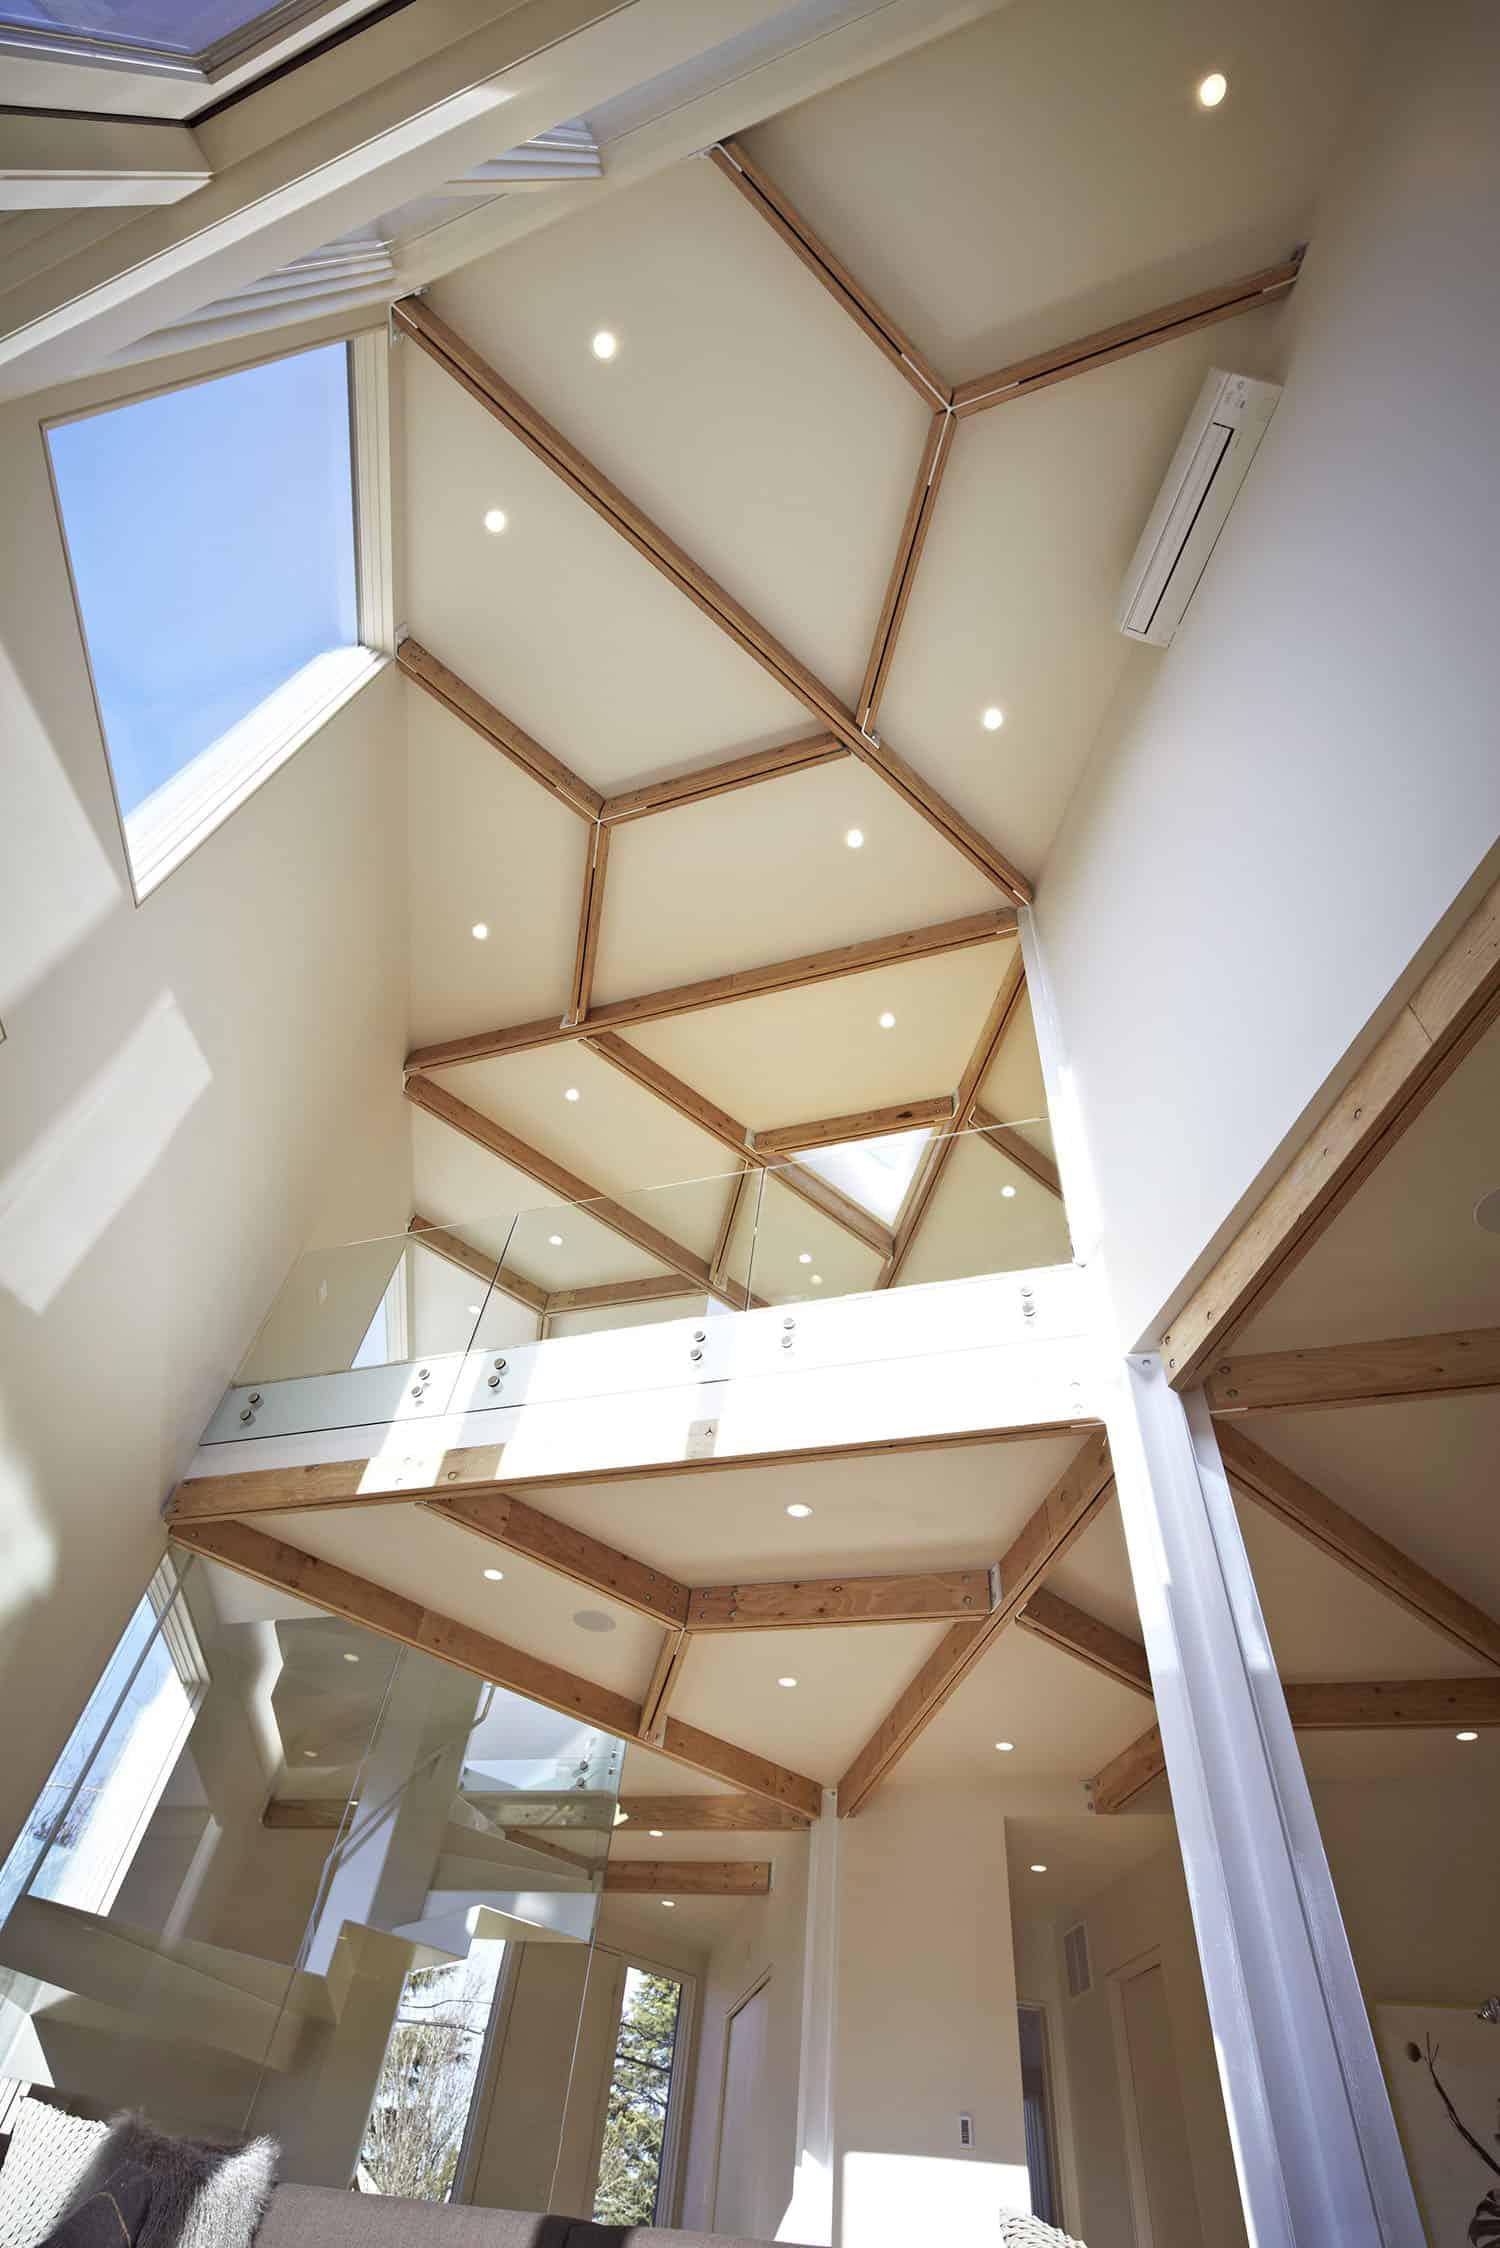 moderno-montažni-dom-strop-detalj